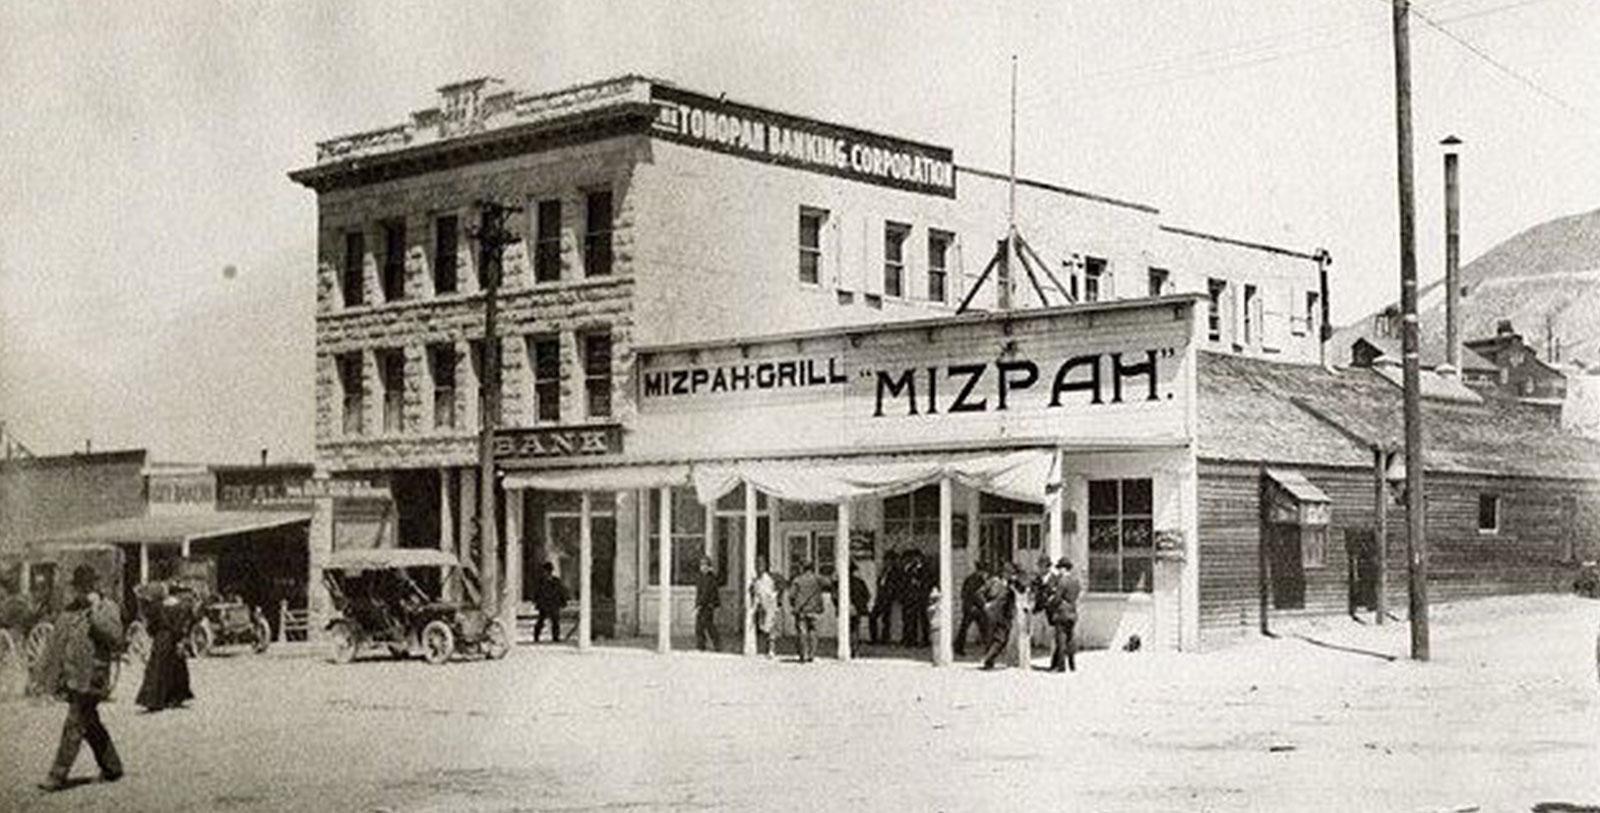 Historic Exterior of Mizpah Hotel, 1907, Member of Historic Hotels of America, in Tonopah, Nevada, History